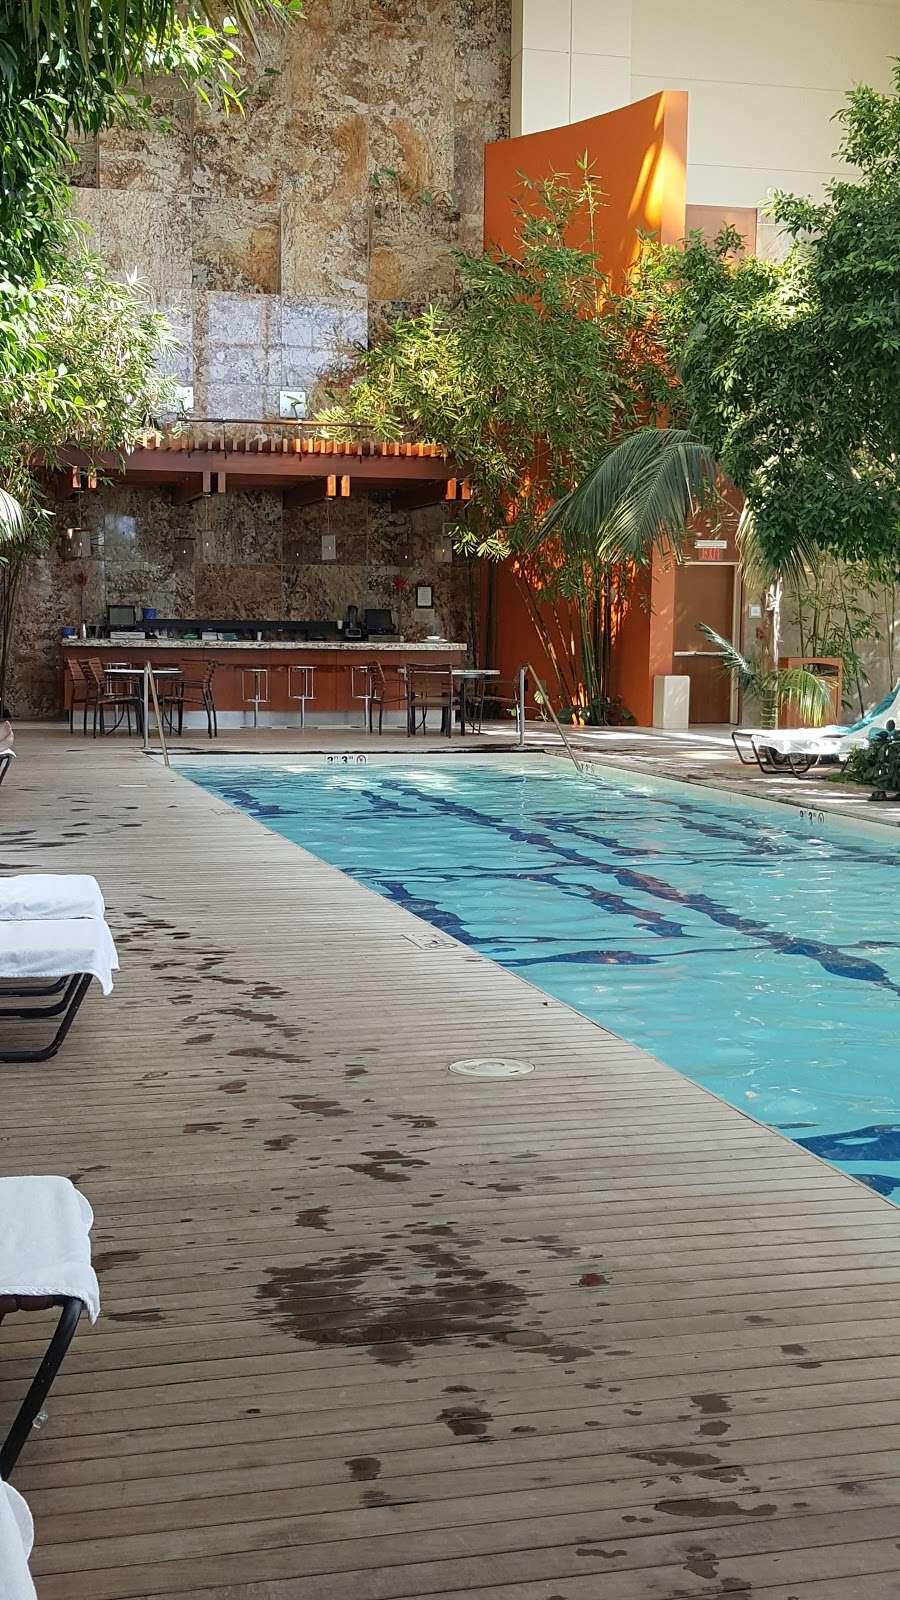 The Water Club Hotel at Borgata - spa    Photo 3 of 10   Address: 1 Renaissance Way, Atlantic City, NJ 08401, USA   Phone: (609) 317-1000